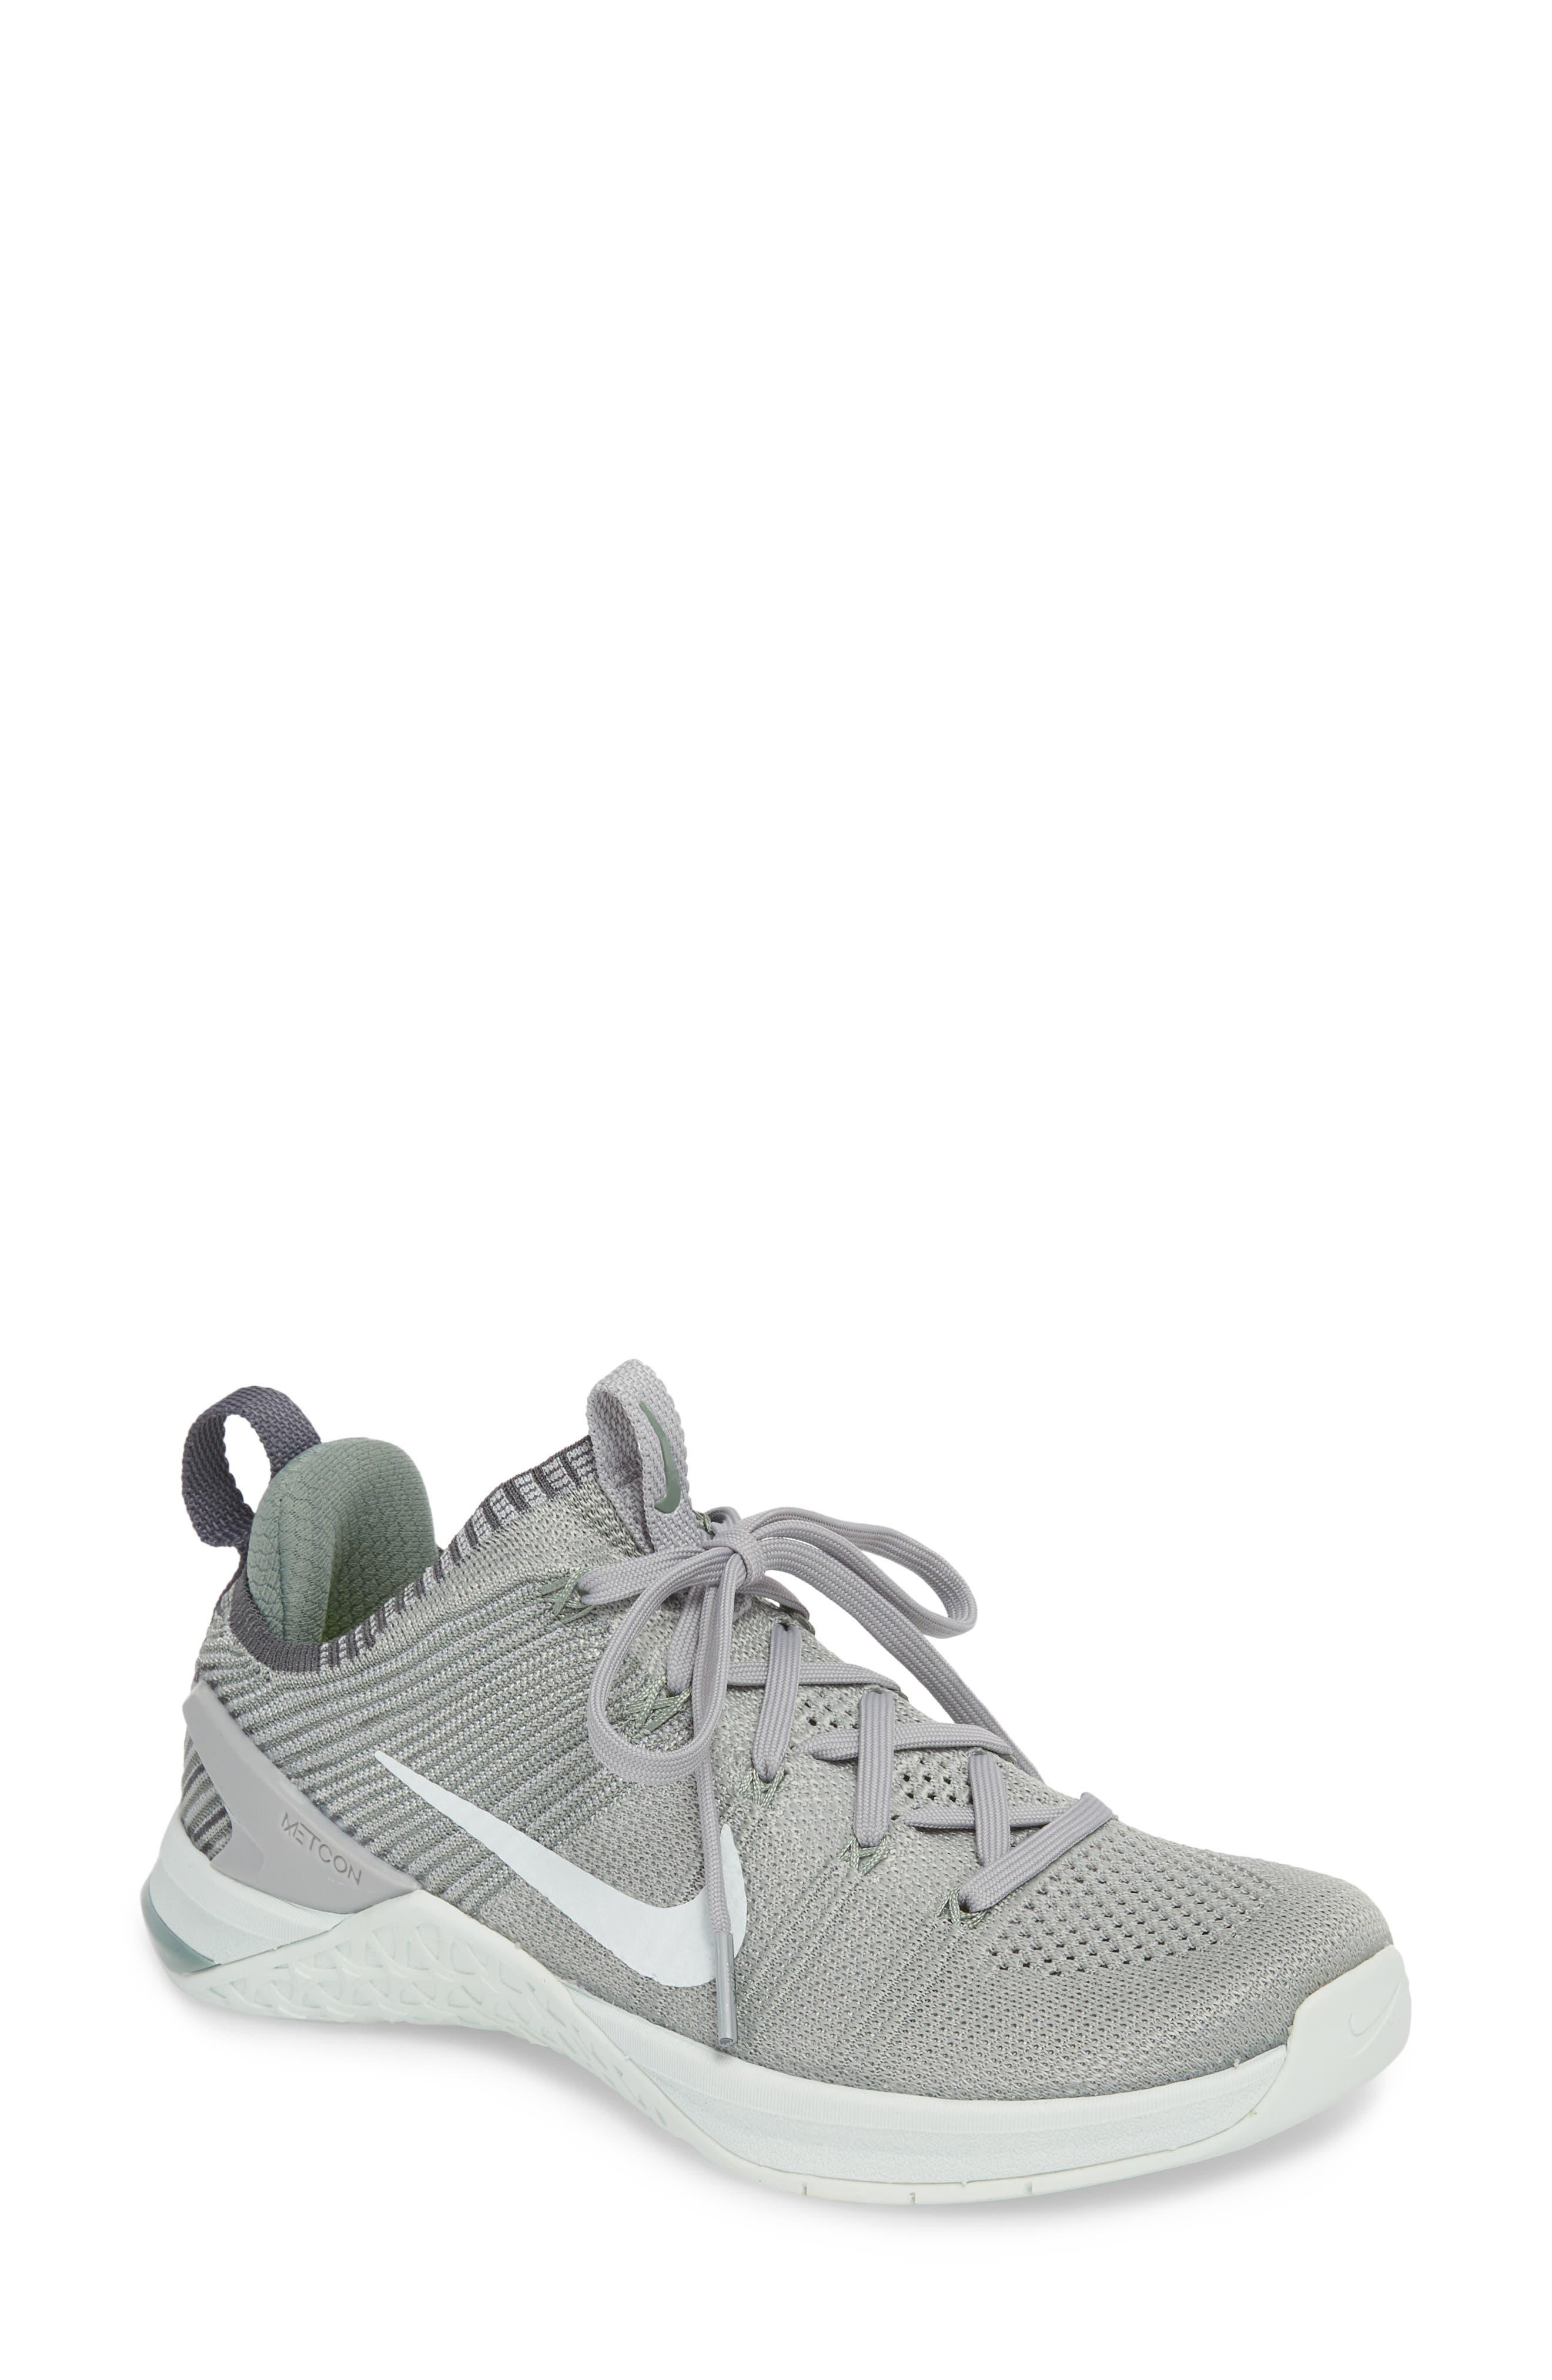 Nike Metcon Dsx Flyknit 2 Training Shoe- Grey